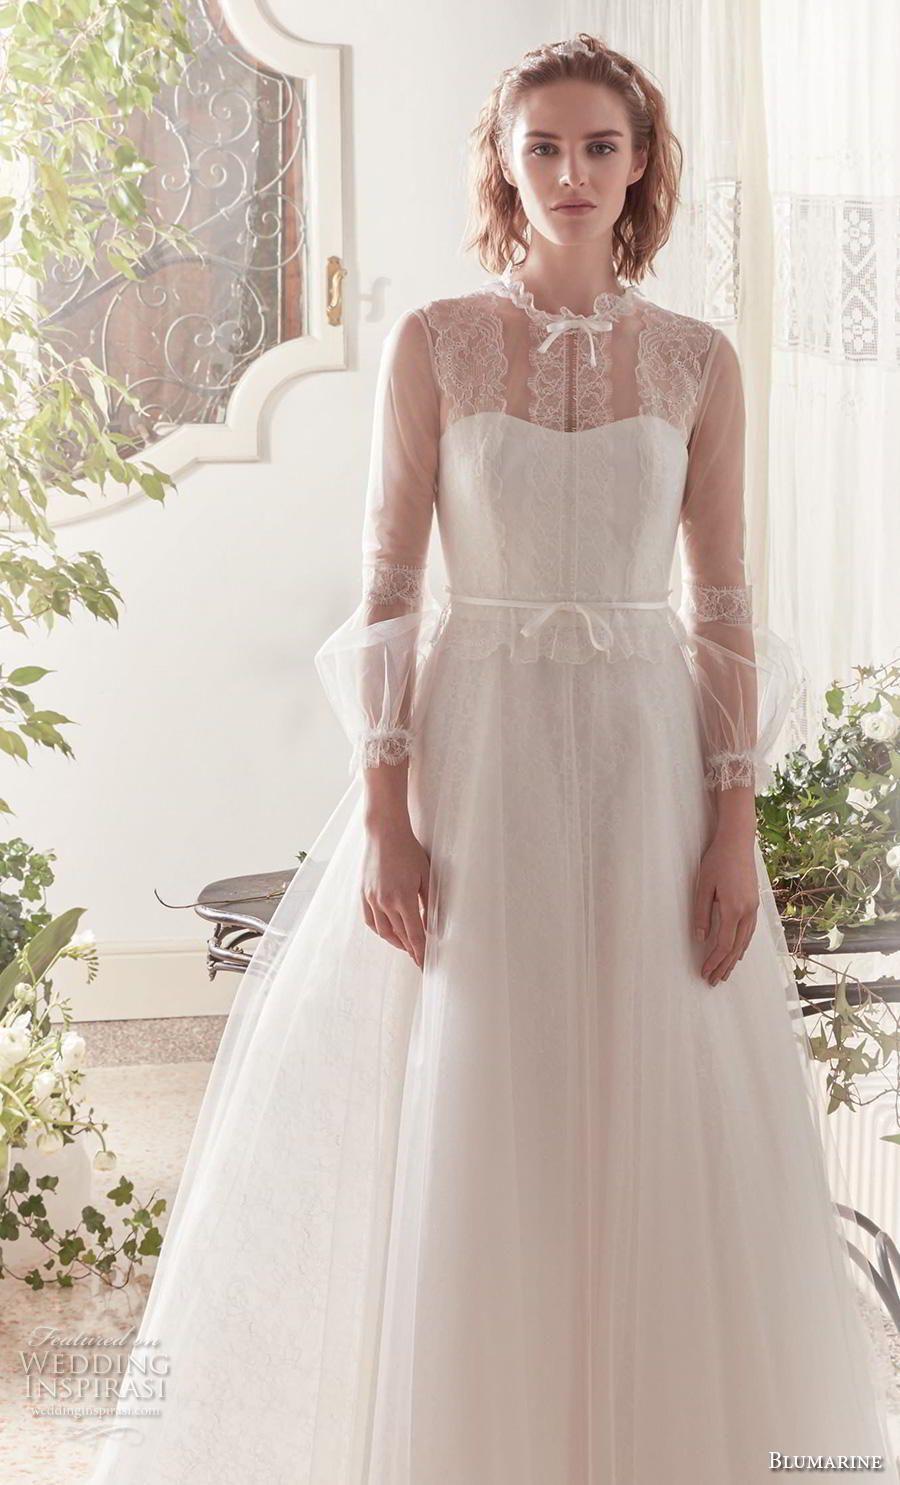 Blumarine Sposa Spring Summer 2019 Wedding Dresses Wedding Inspirasi Long Train Wedding Dress Wedding Dresses Wedding Dresses Summer Simple [ 1485 x 900 Pixel ]